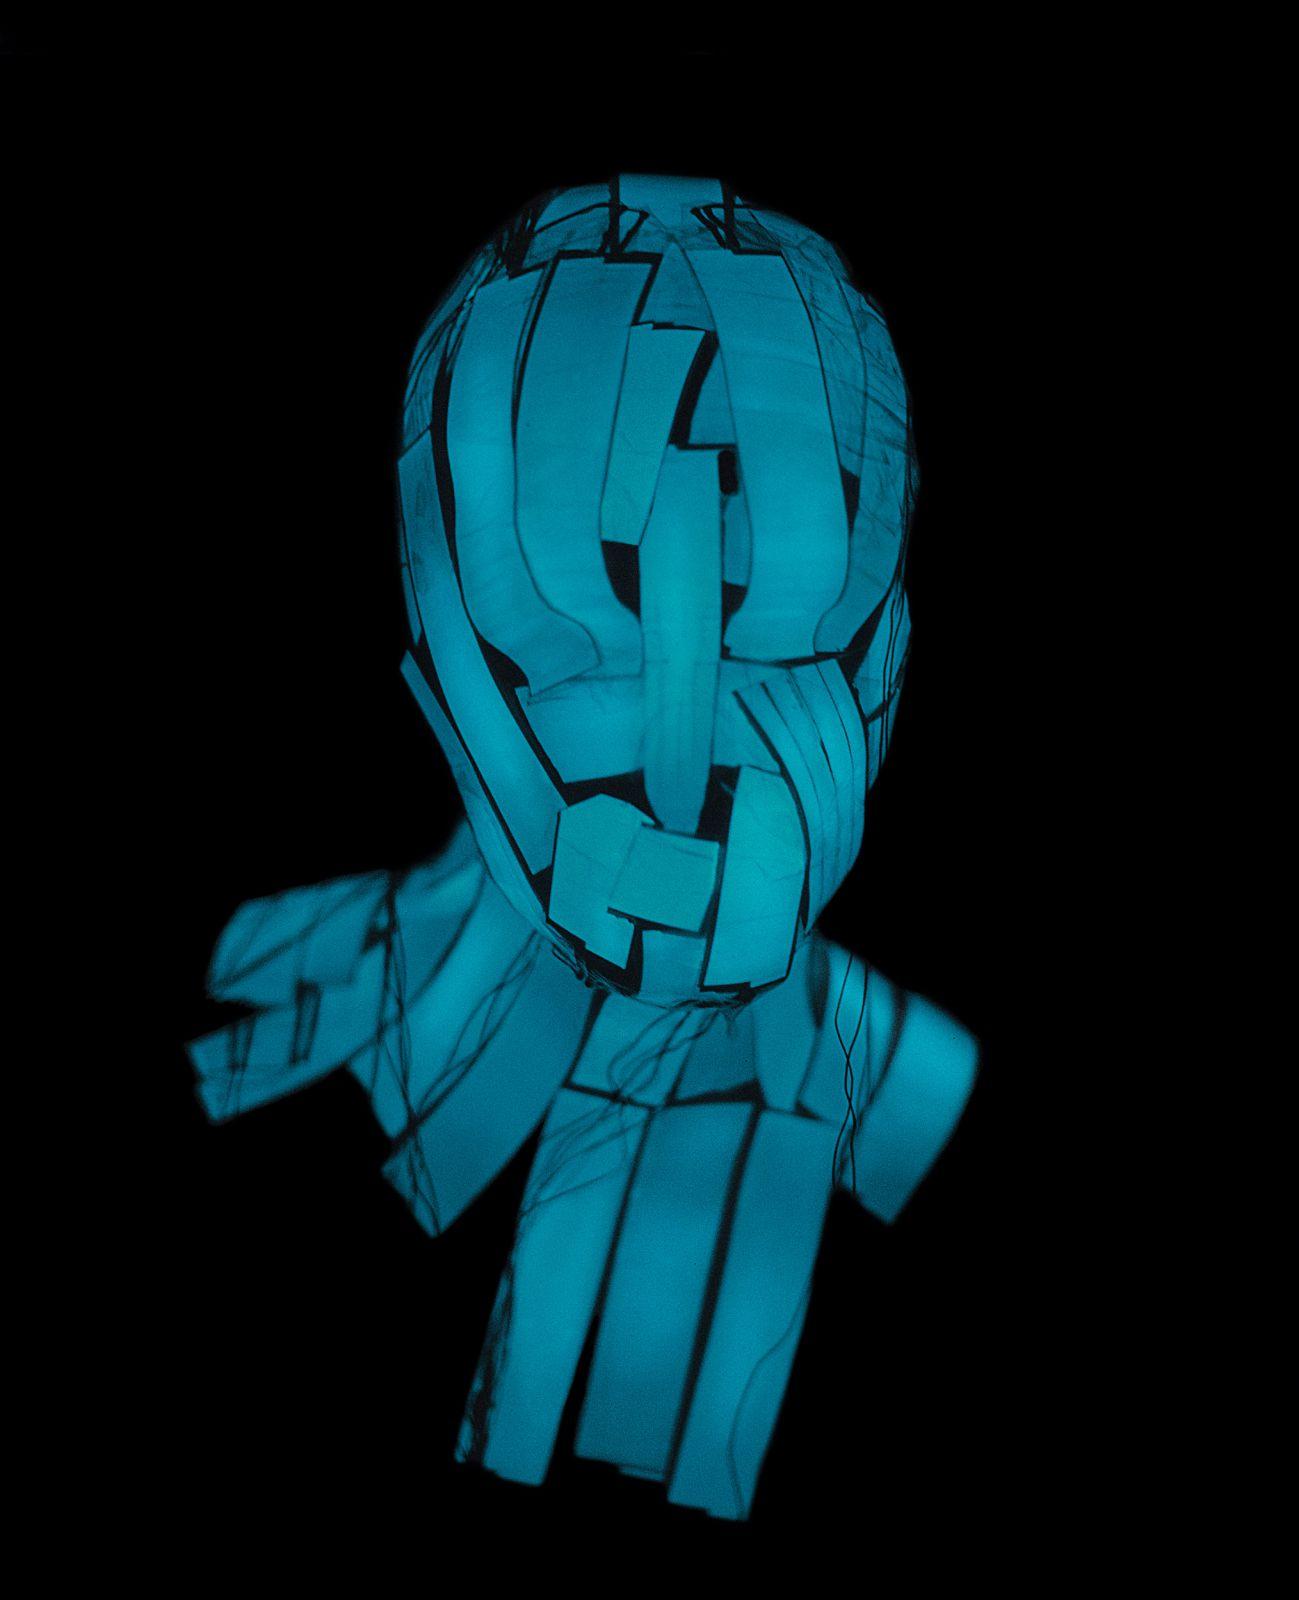 c-print mounted | 120 x 100cm & 60 x 50 cm